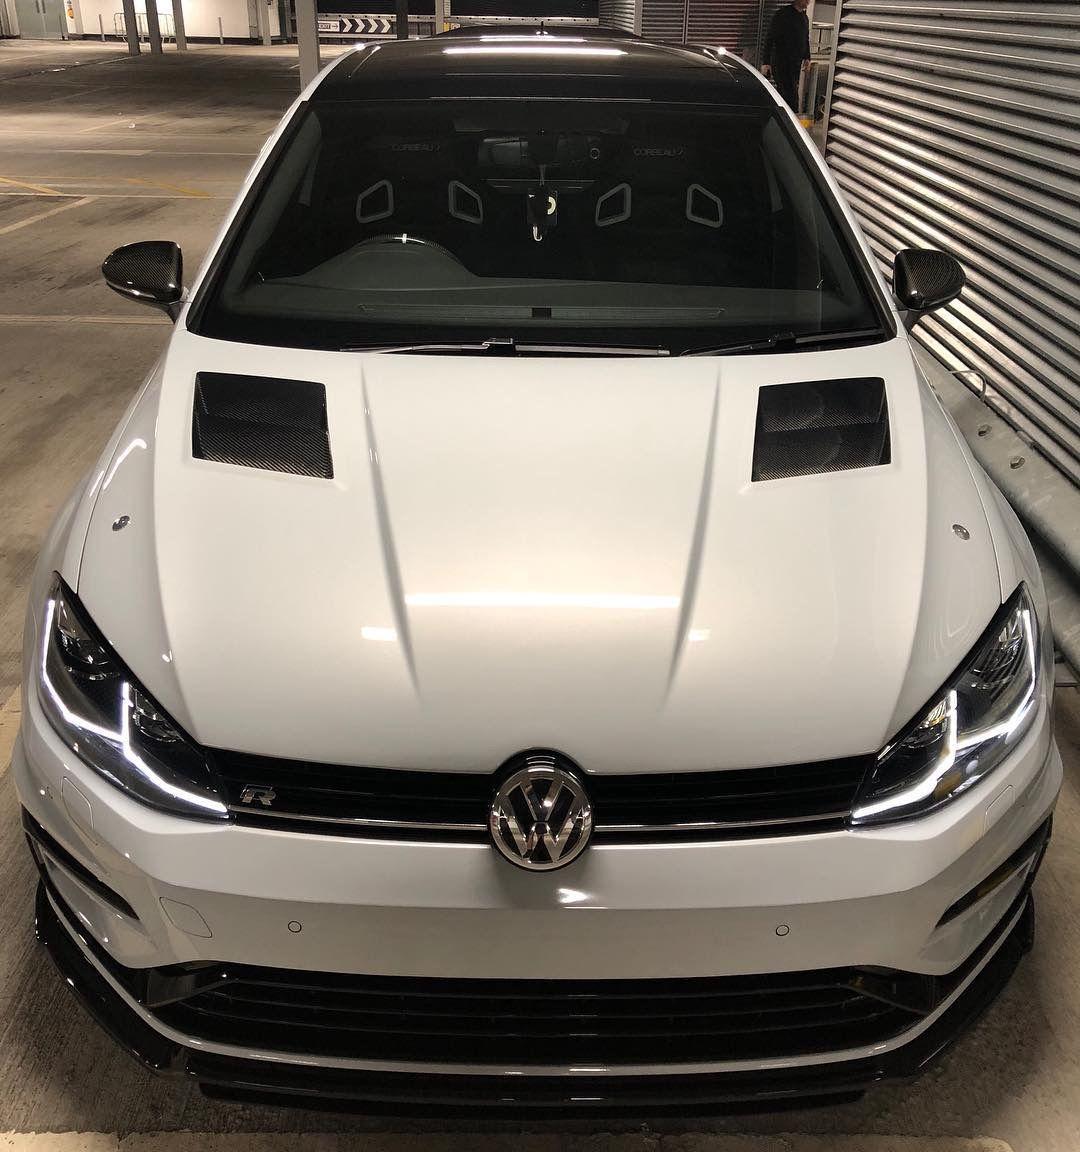 Golf 7 5 R Volkswagen Volkswagen Golf R Car Volkswagen